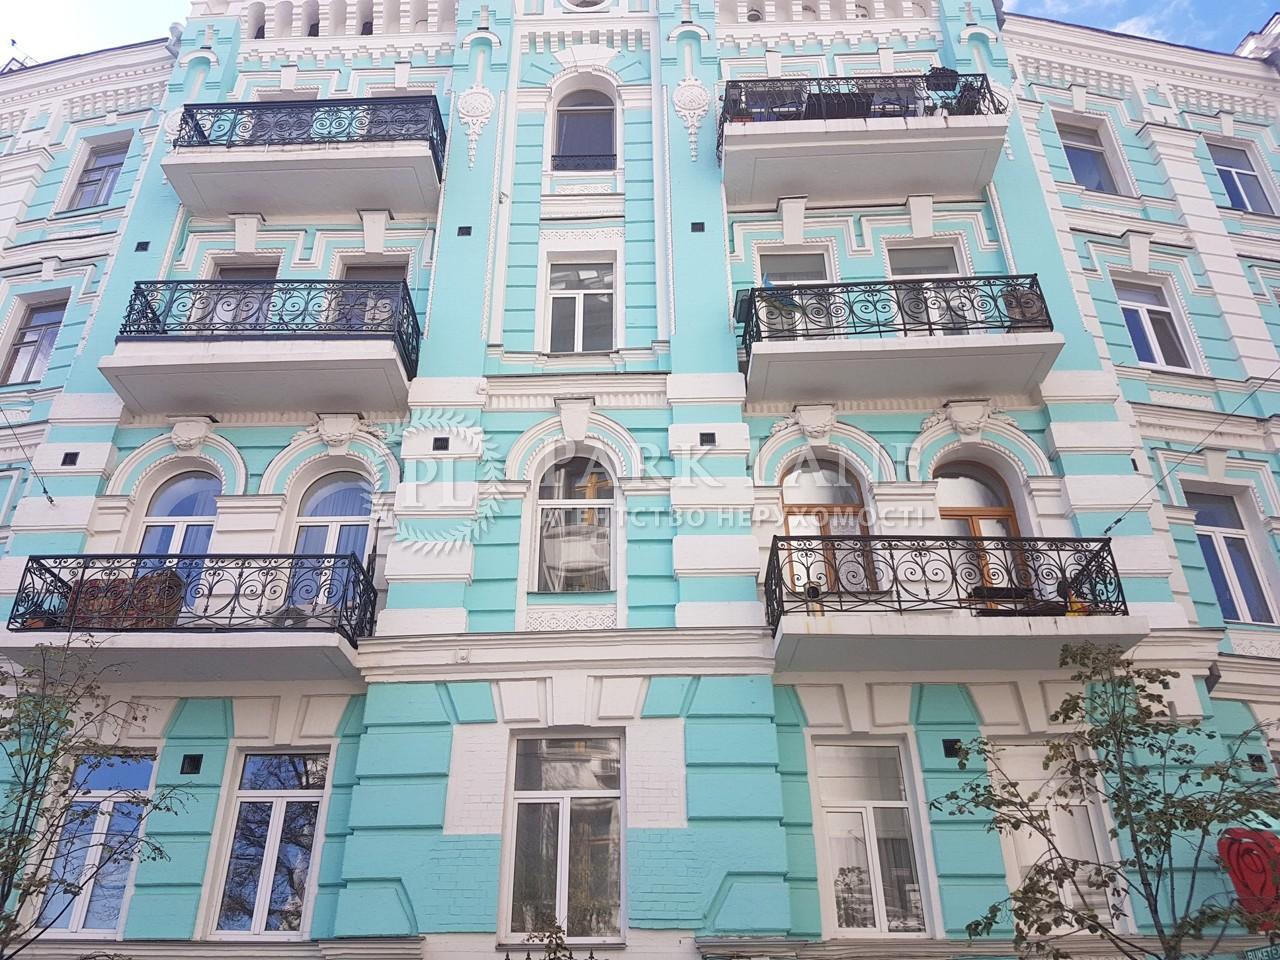 Квартира ул. Десятинная, 1/3, Киев, L-24660 - Фото 1